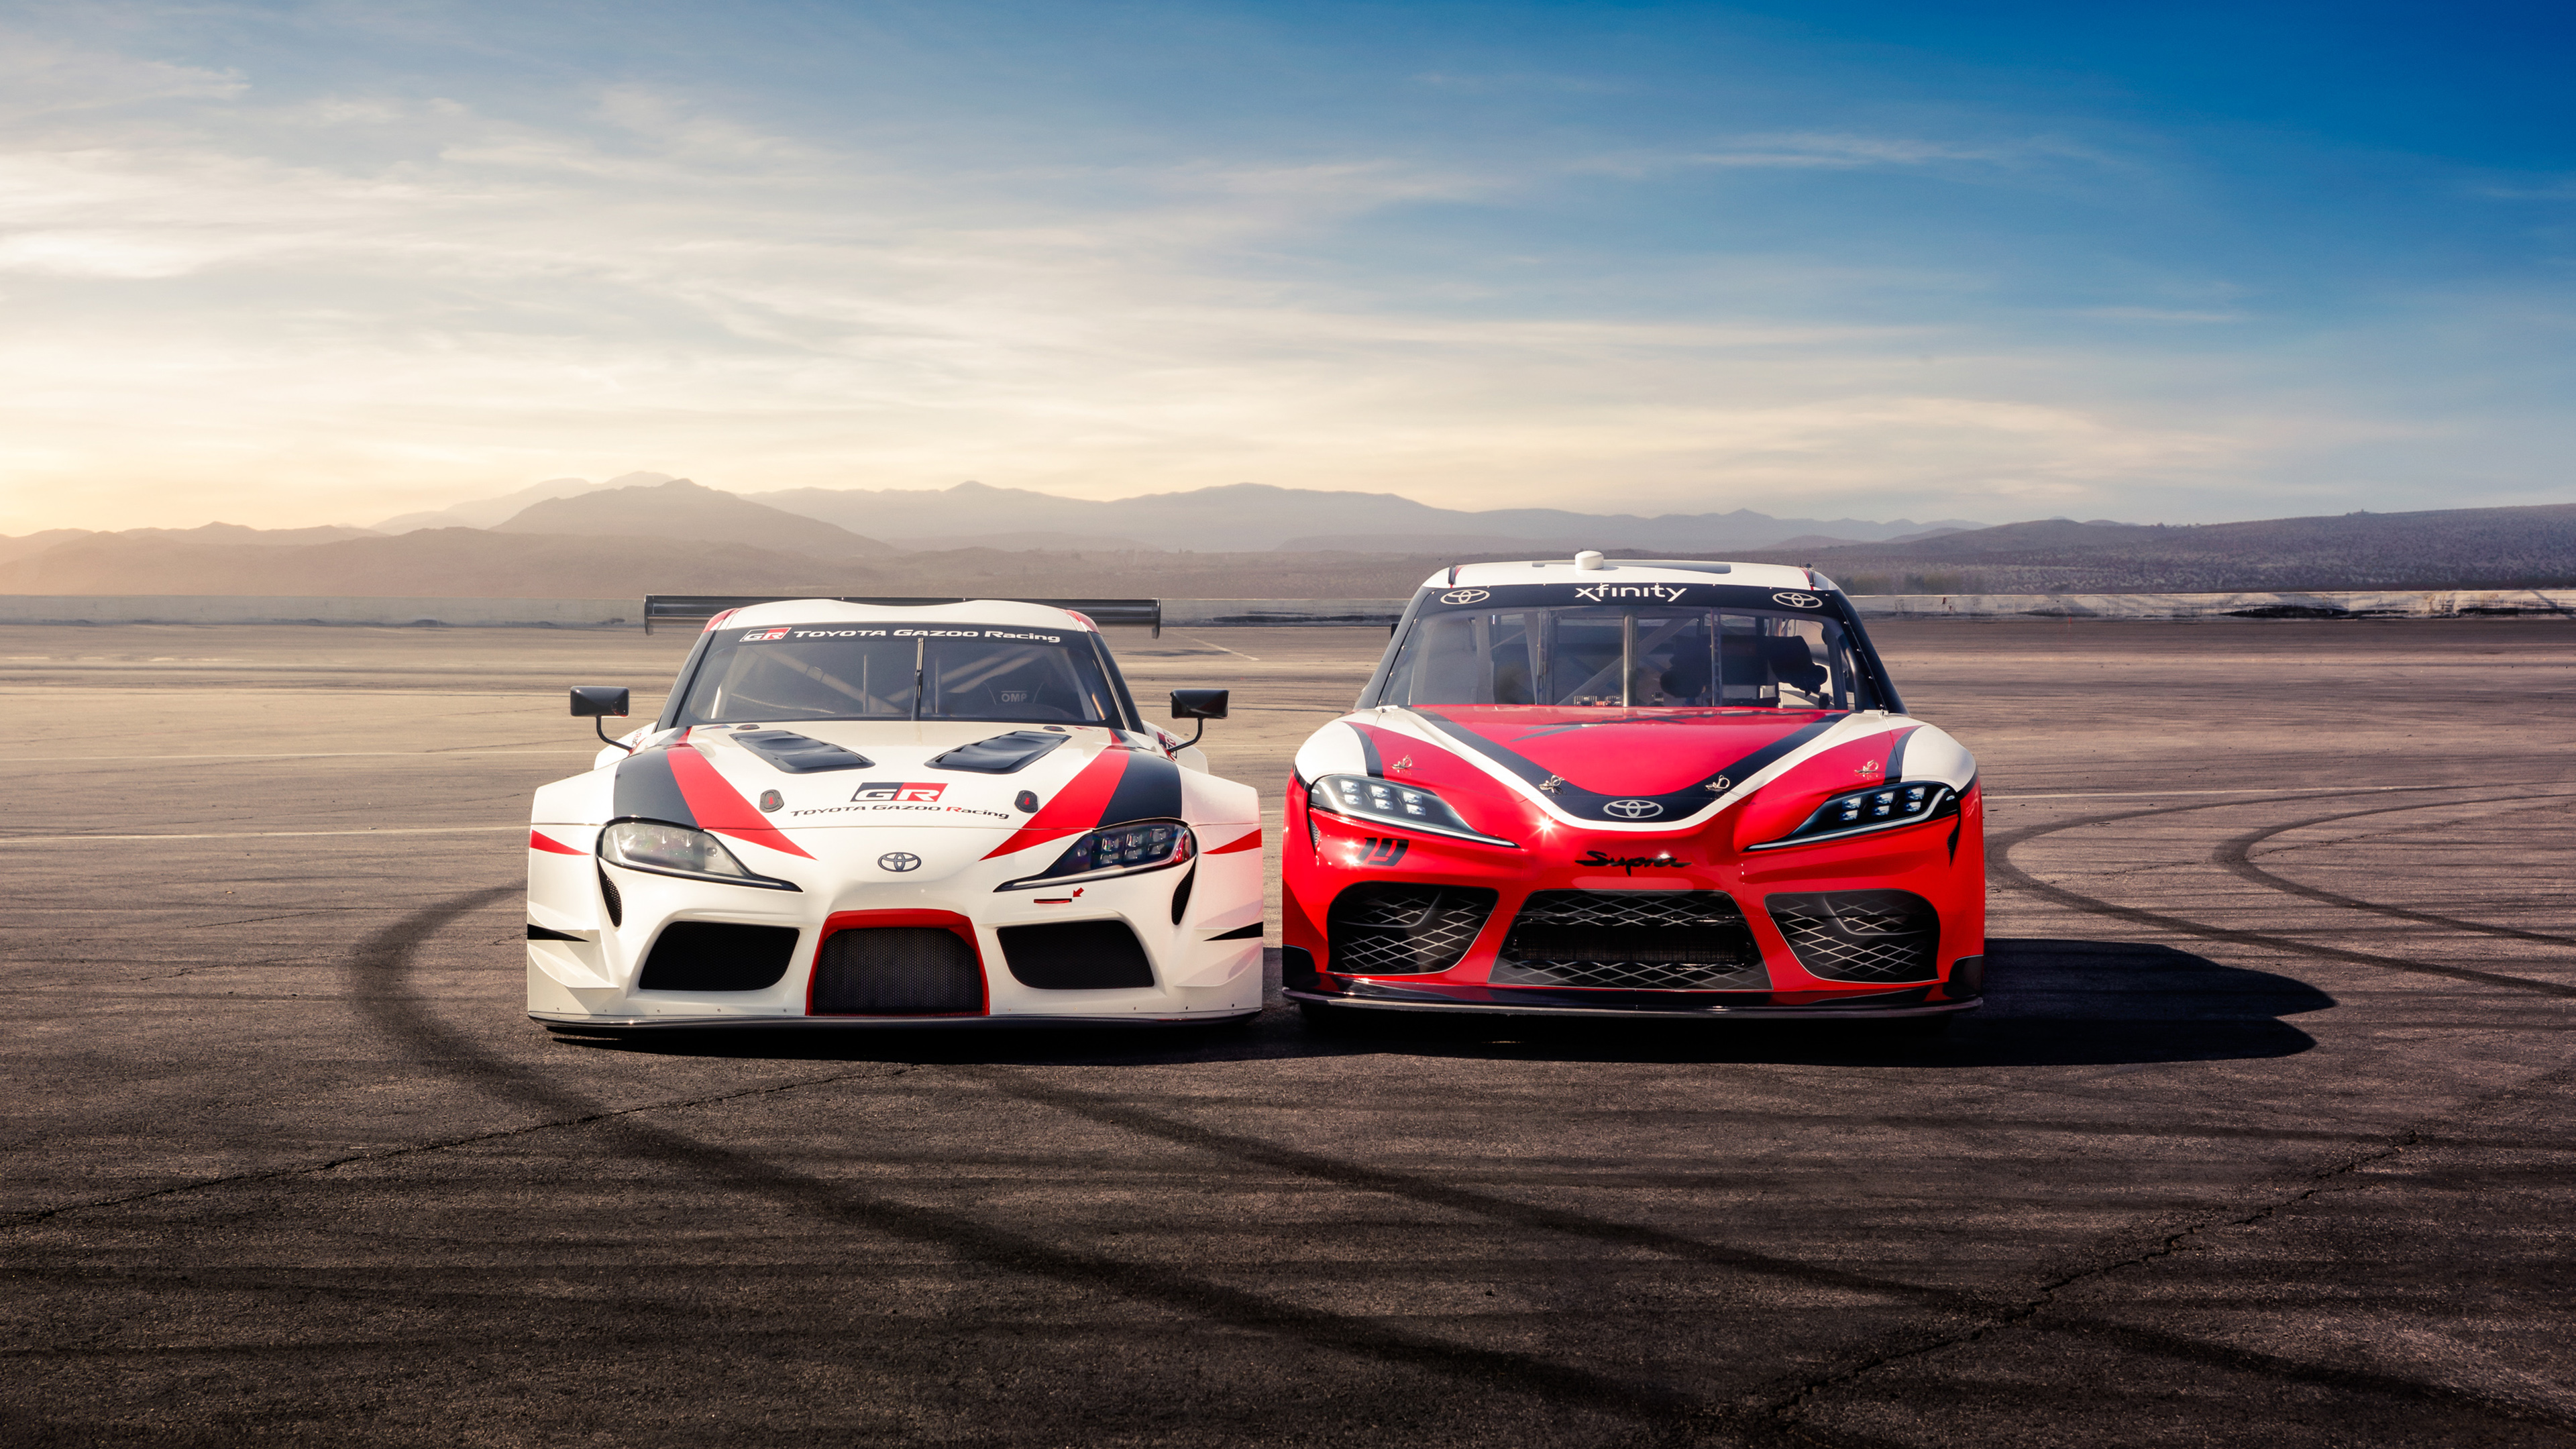 Toyota Supra 2018 4K 3 Wallpaper